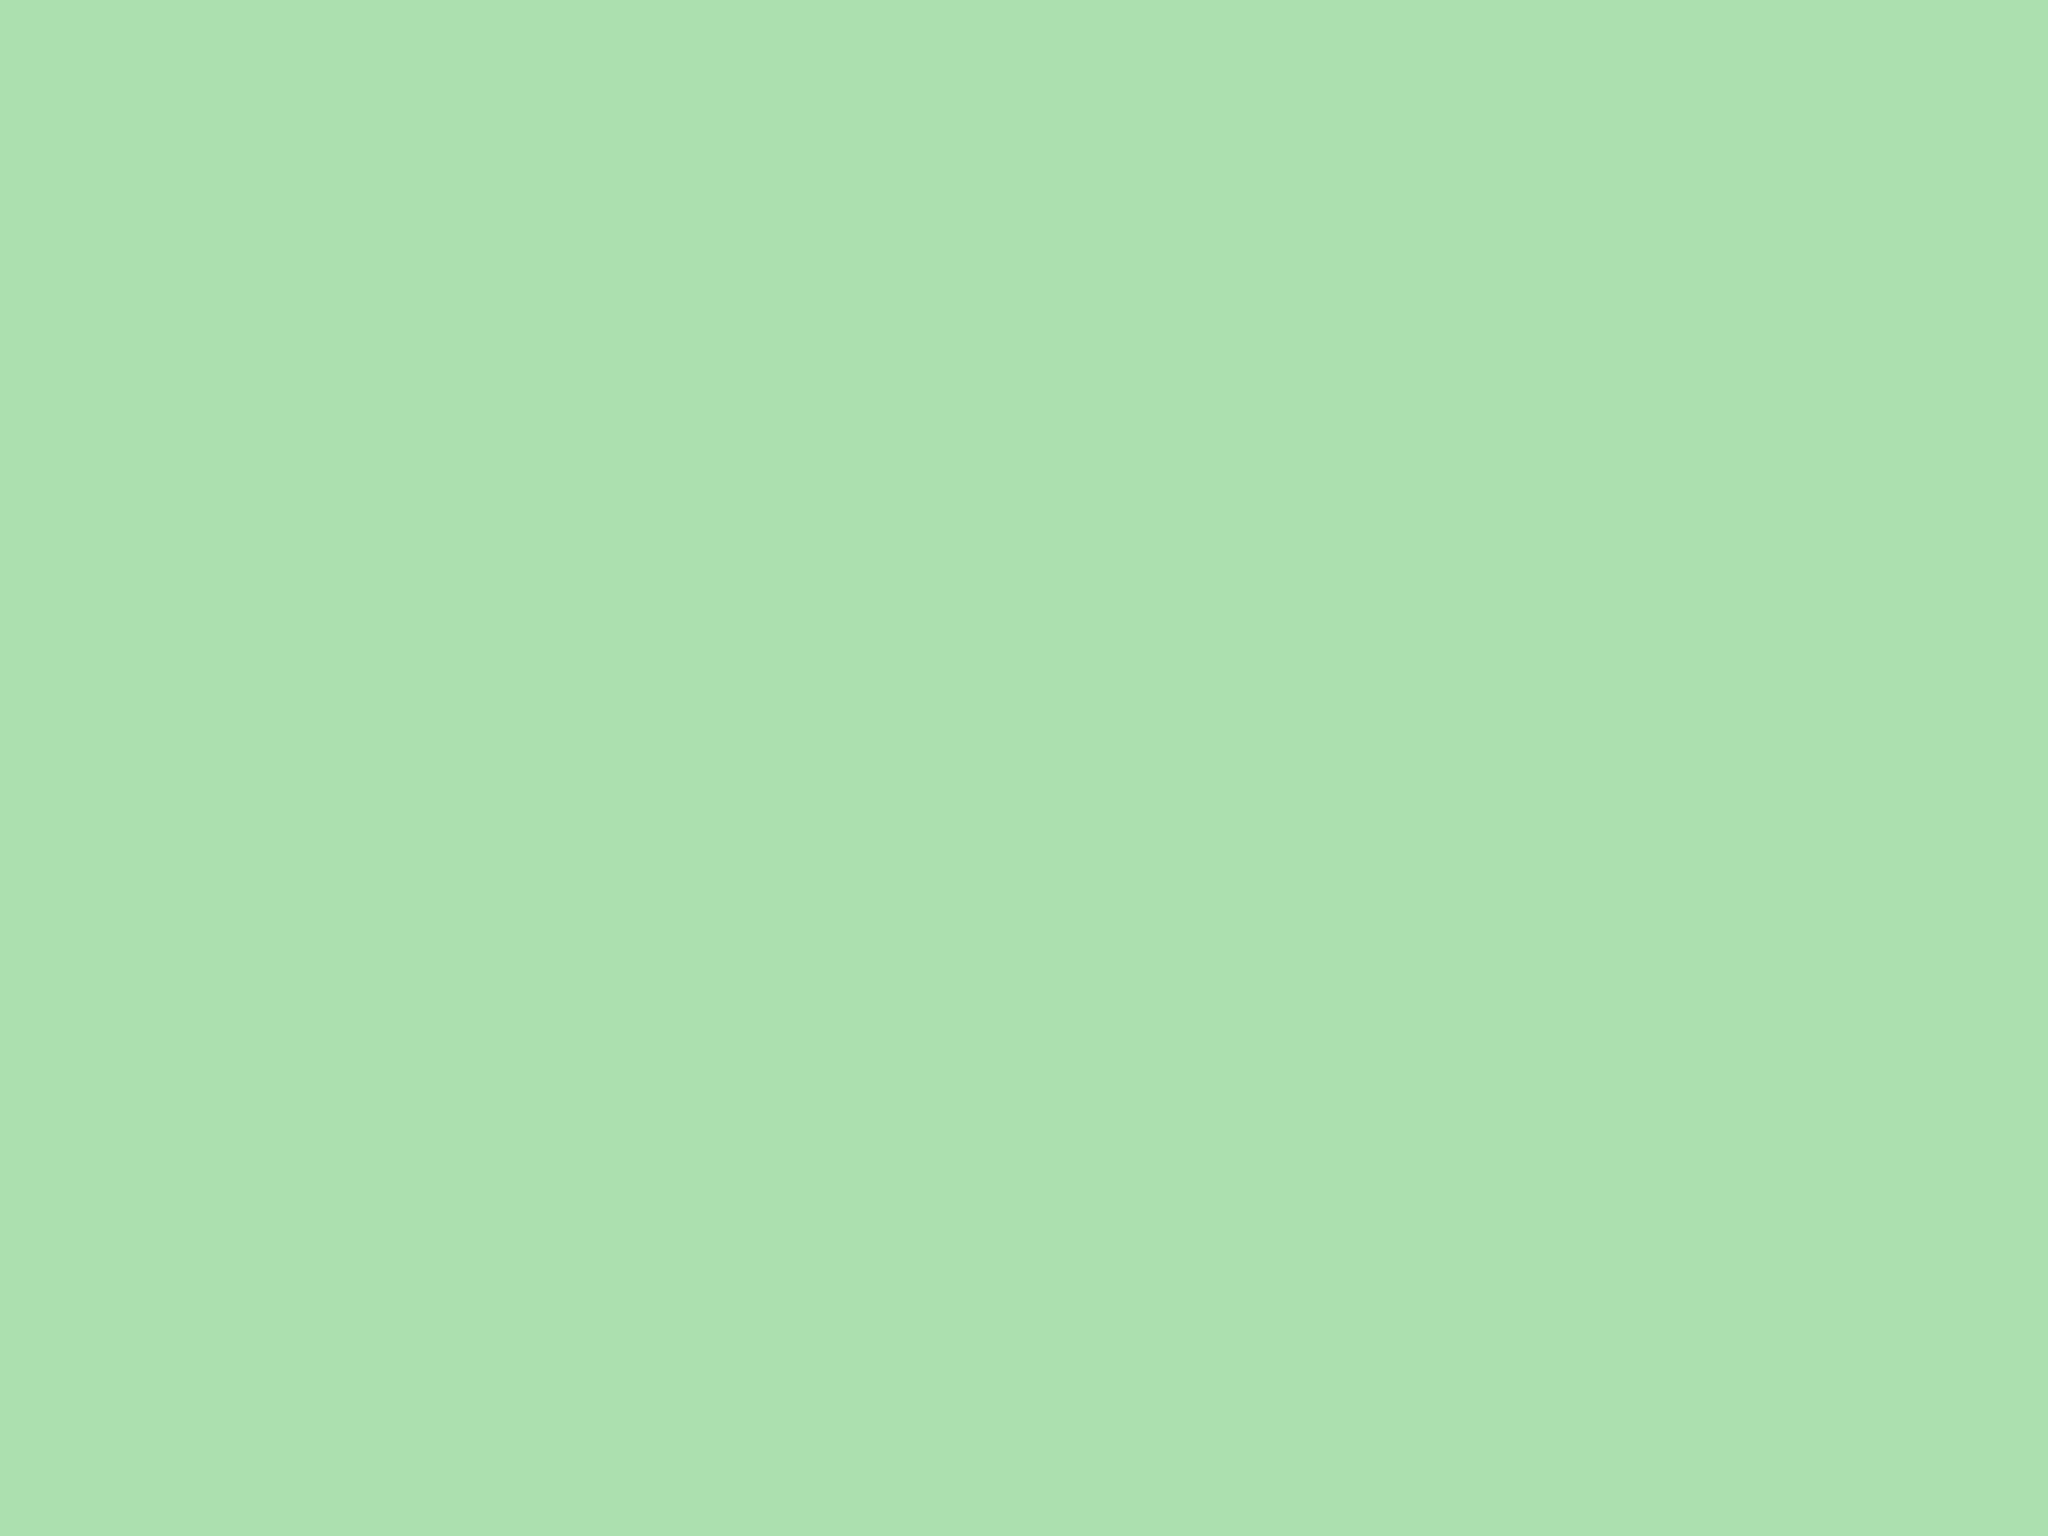 2048x1536 Celadon Solid Color Background